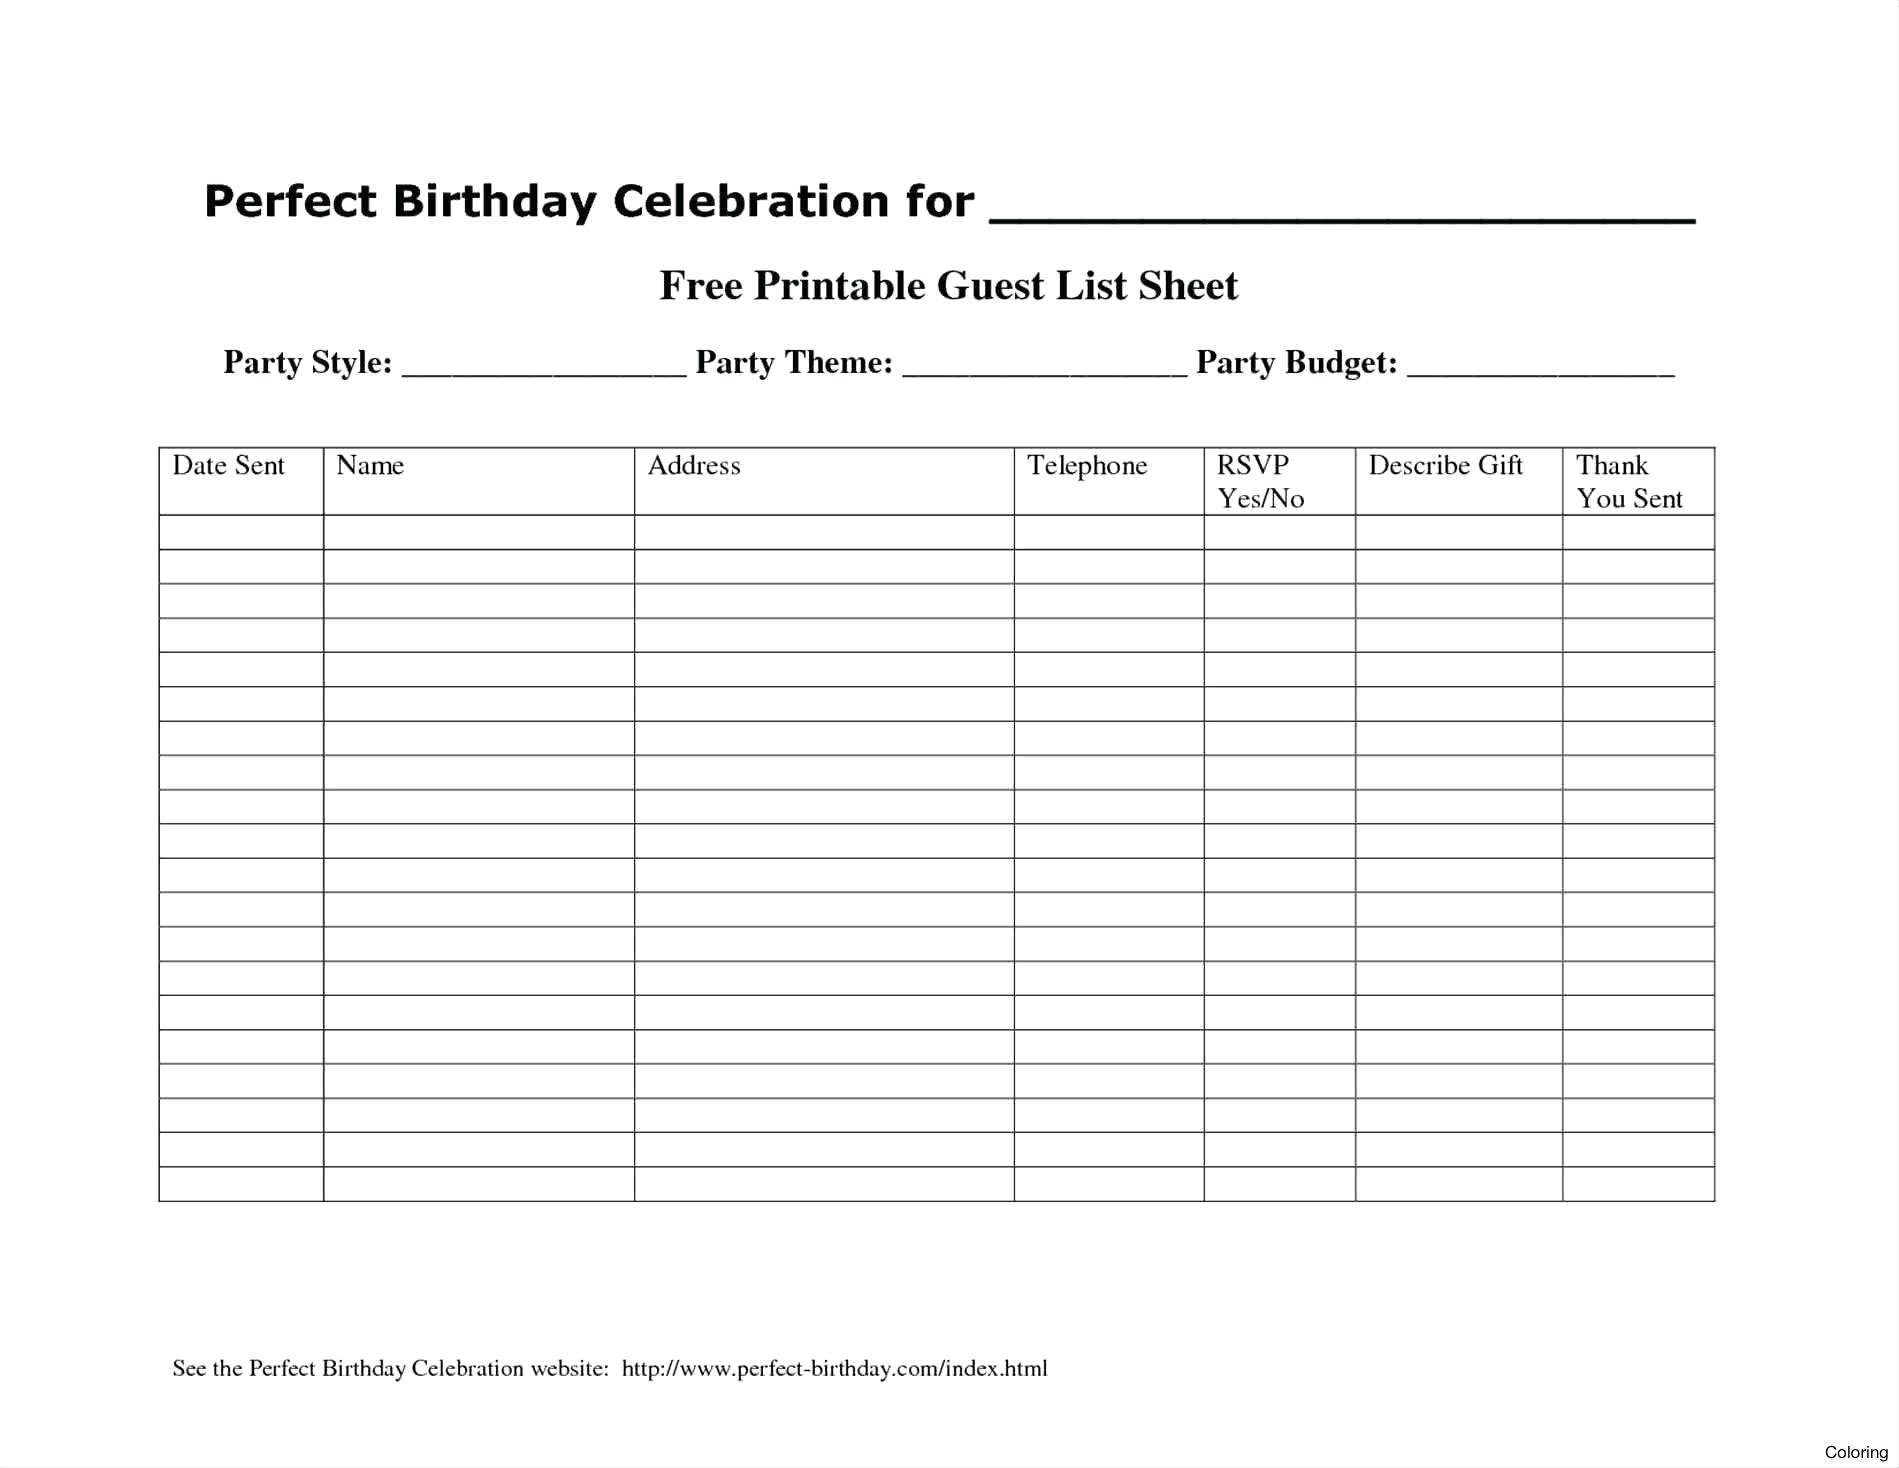 020 Template Ideas Free Wedding Guest List Guestlist Download Excel - Free Printable Birthday Guest List